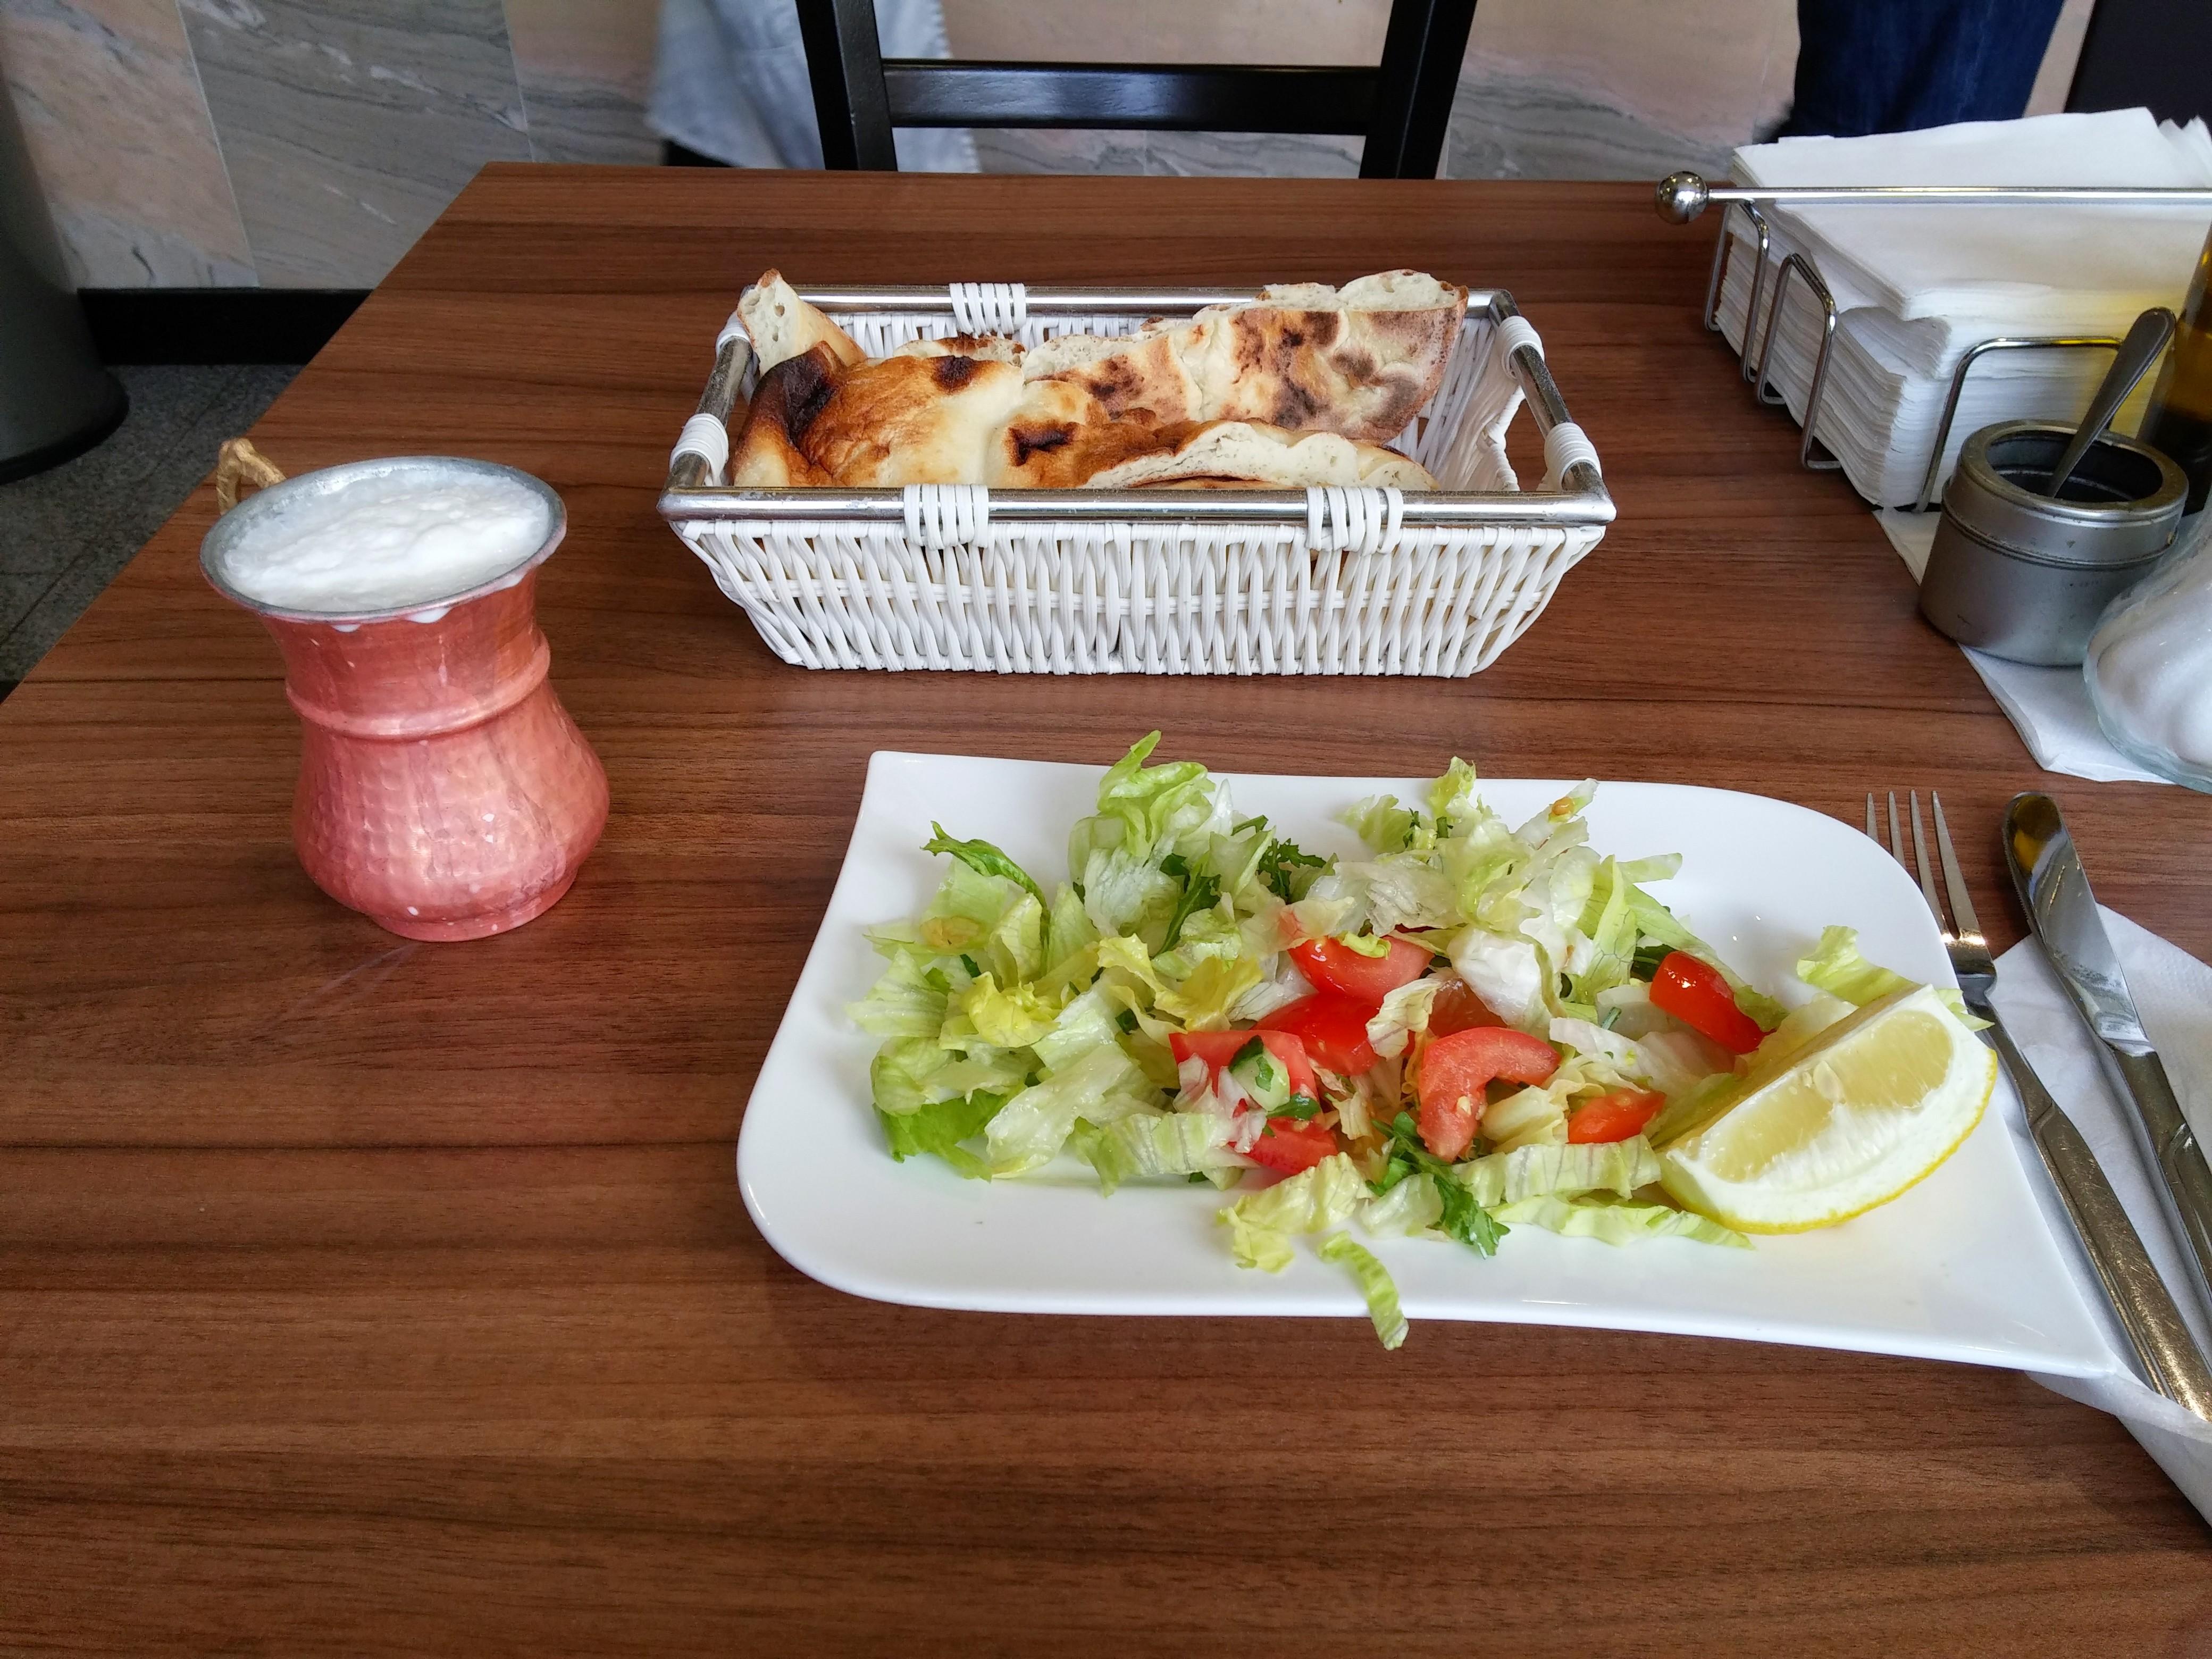 https://foodloader.net/nico_2014-11-14_salat-und-brot.jpg